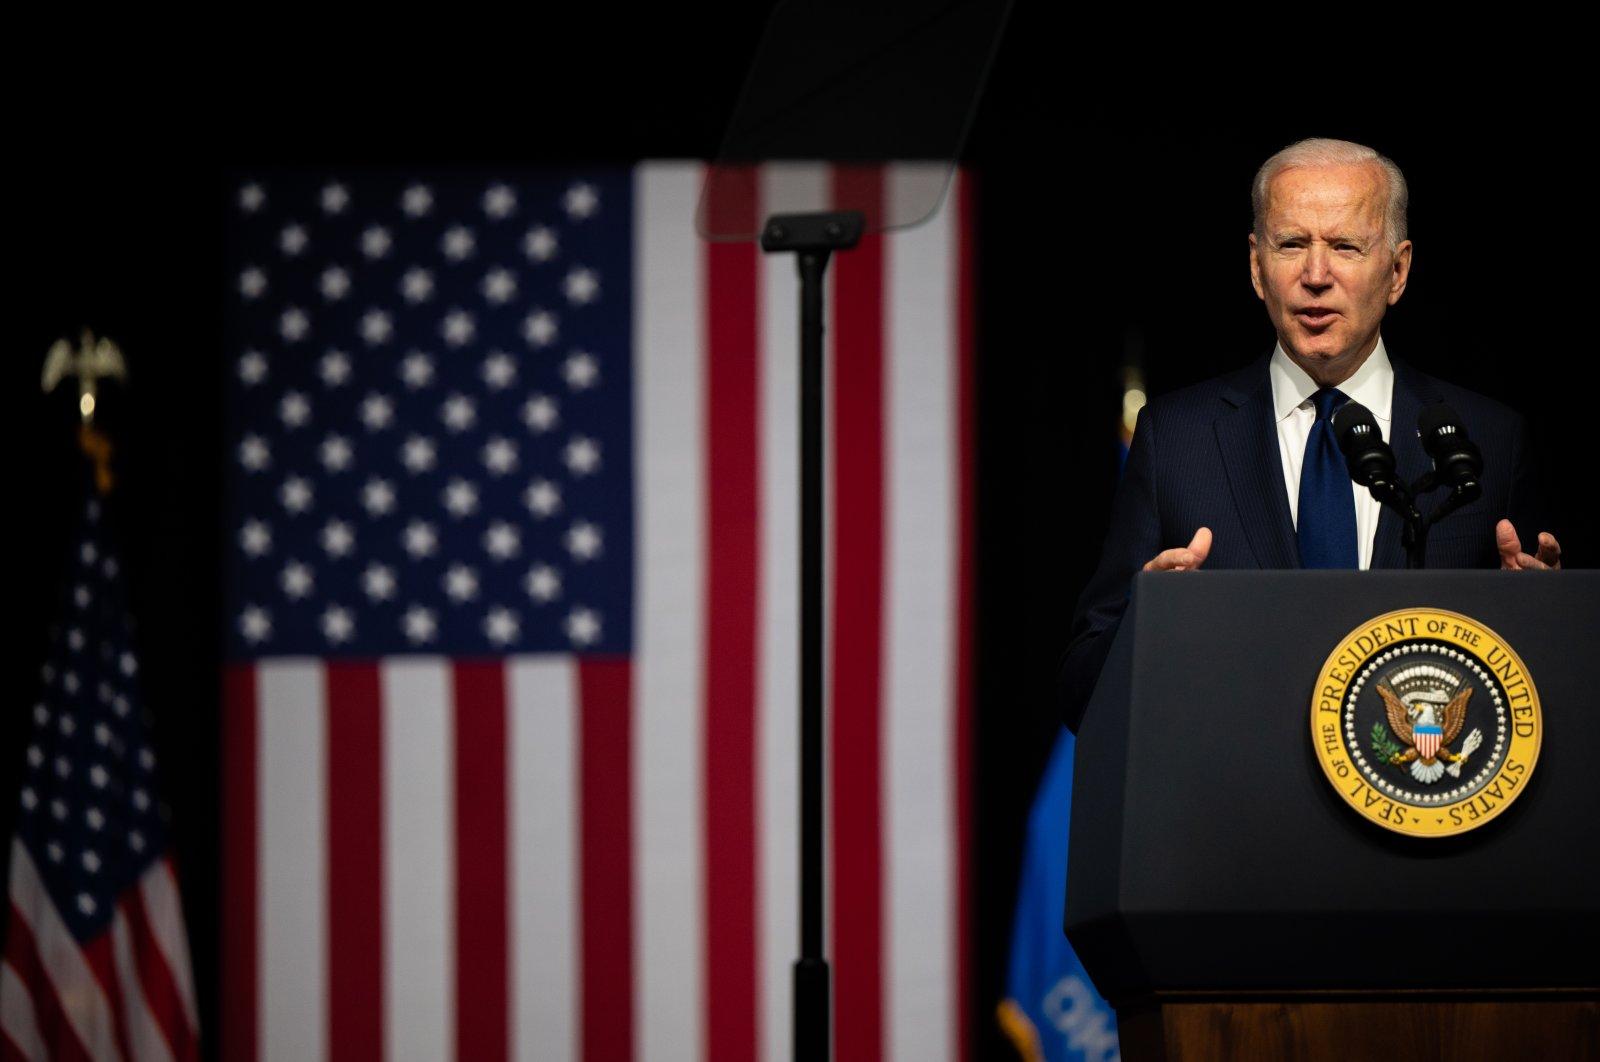 U.S. President Joe Biden speaks at a rally, Tulsa, Oklahoma, U.S., June 1, 2021. (Photo by Getty Images)